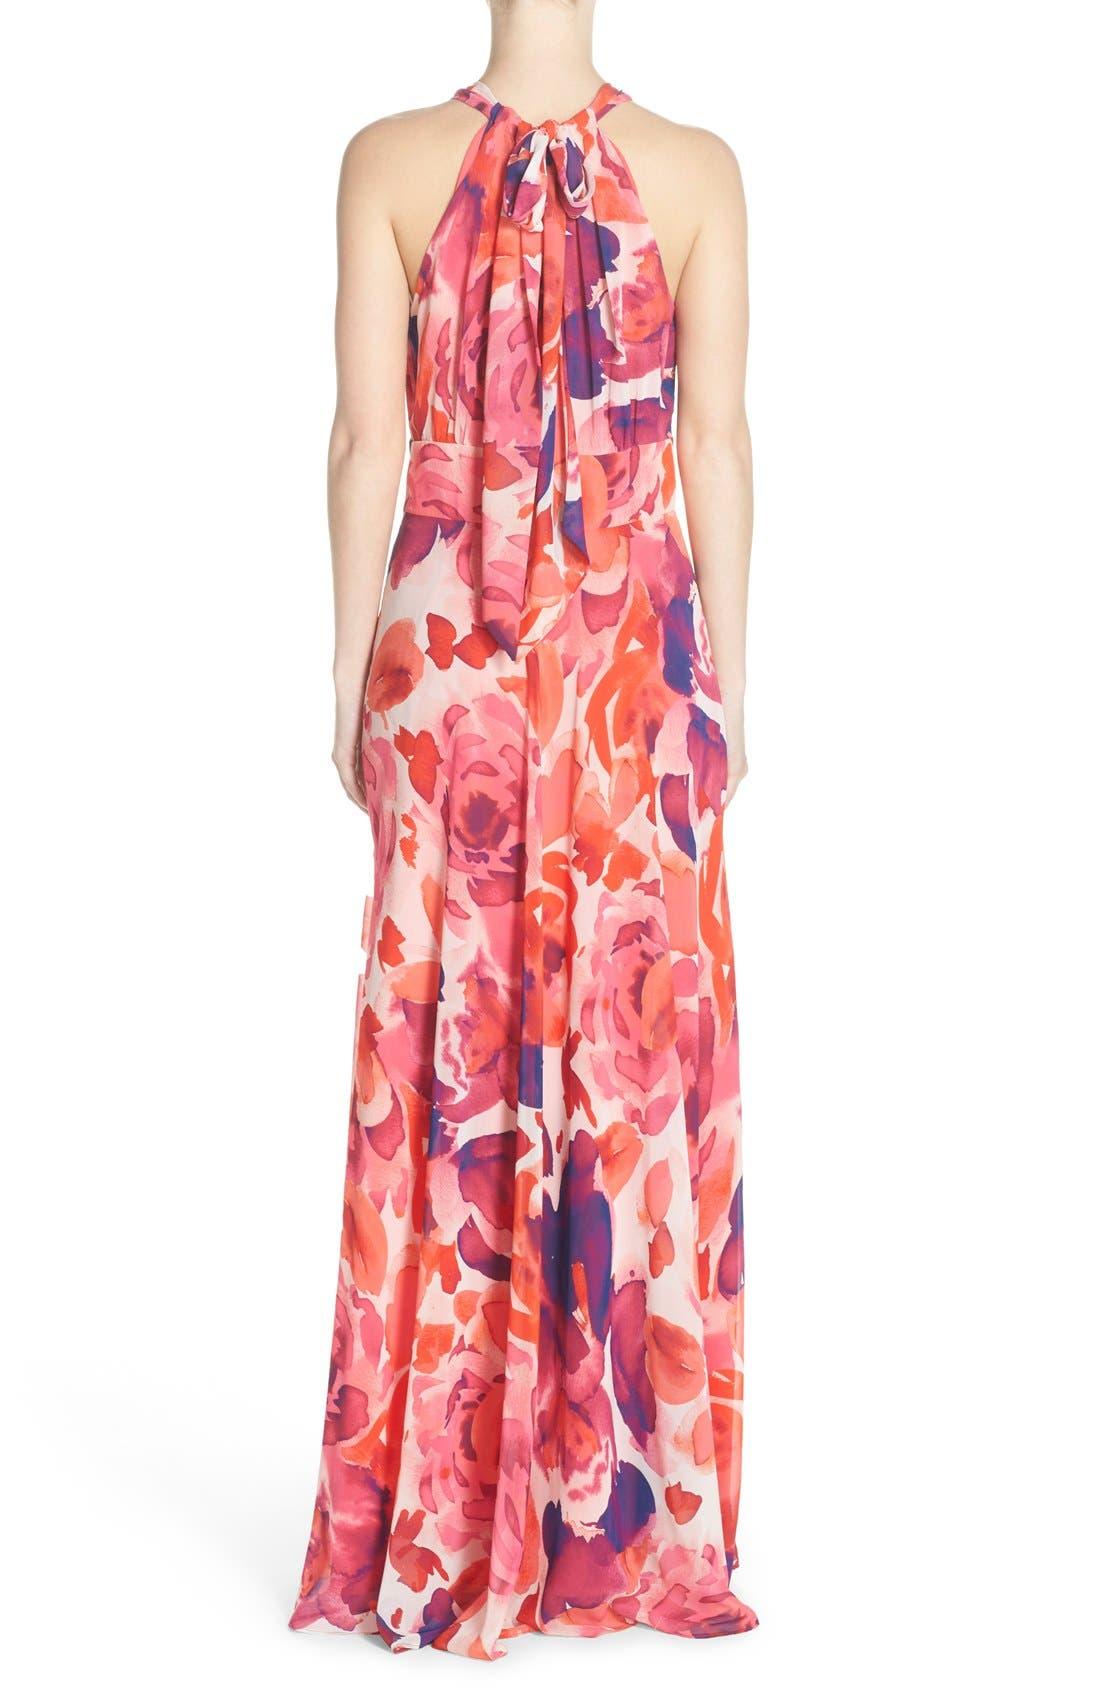 Floral Print Halter Maxi Dress,                             Alternate thumbnail 2, color,                             Pink/ Coral/ Purple